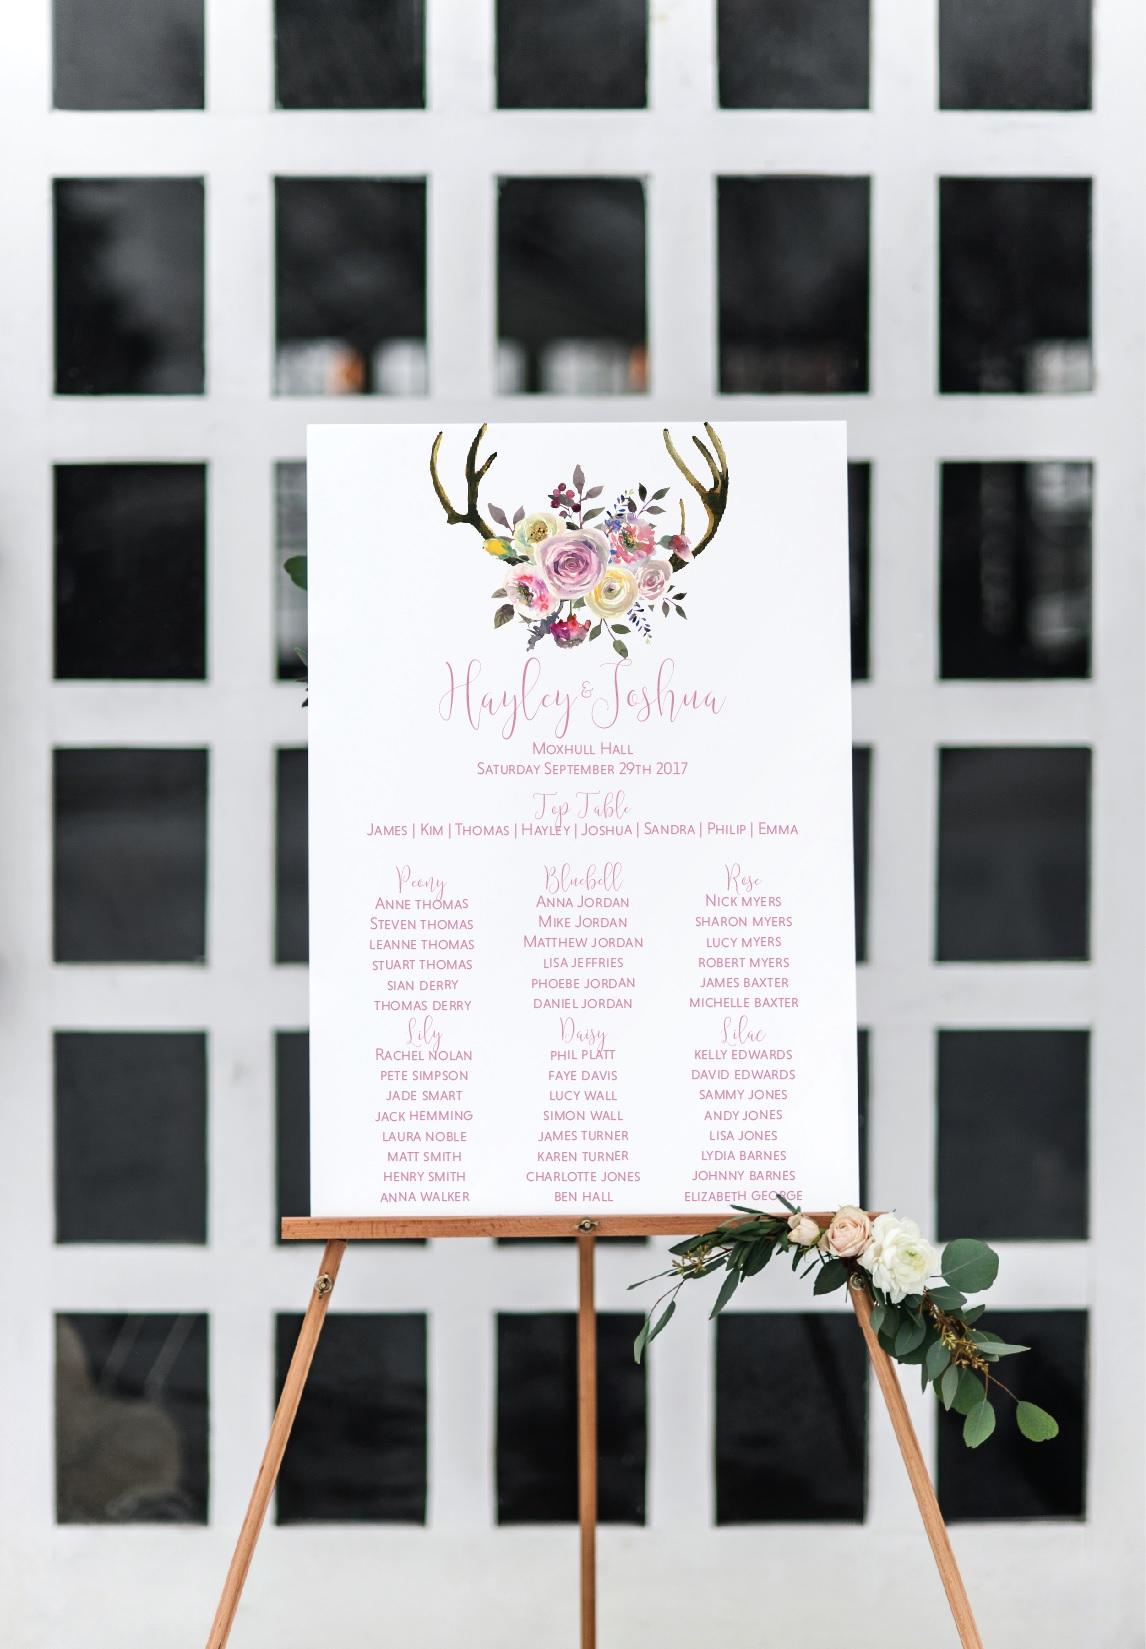 Pretty rustic wedding table plan